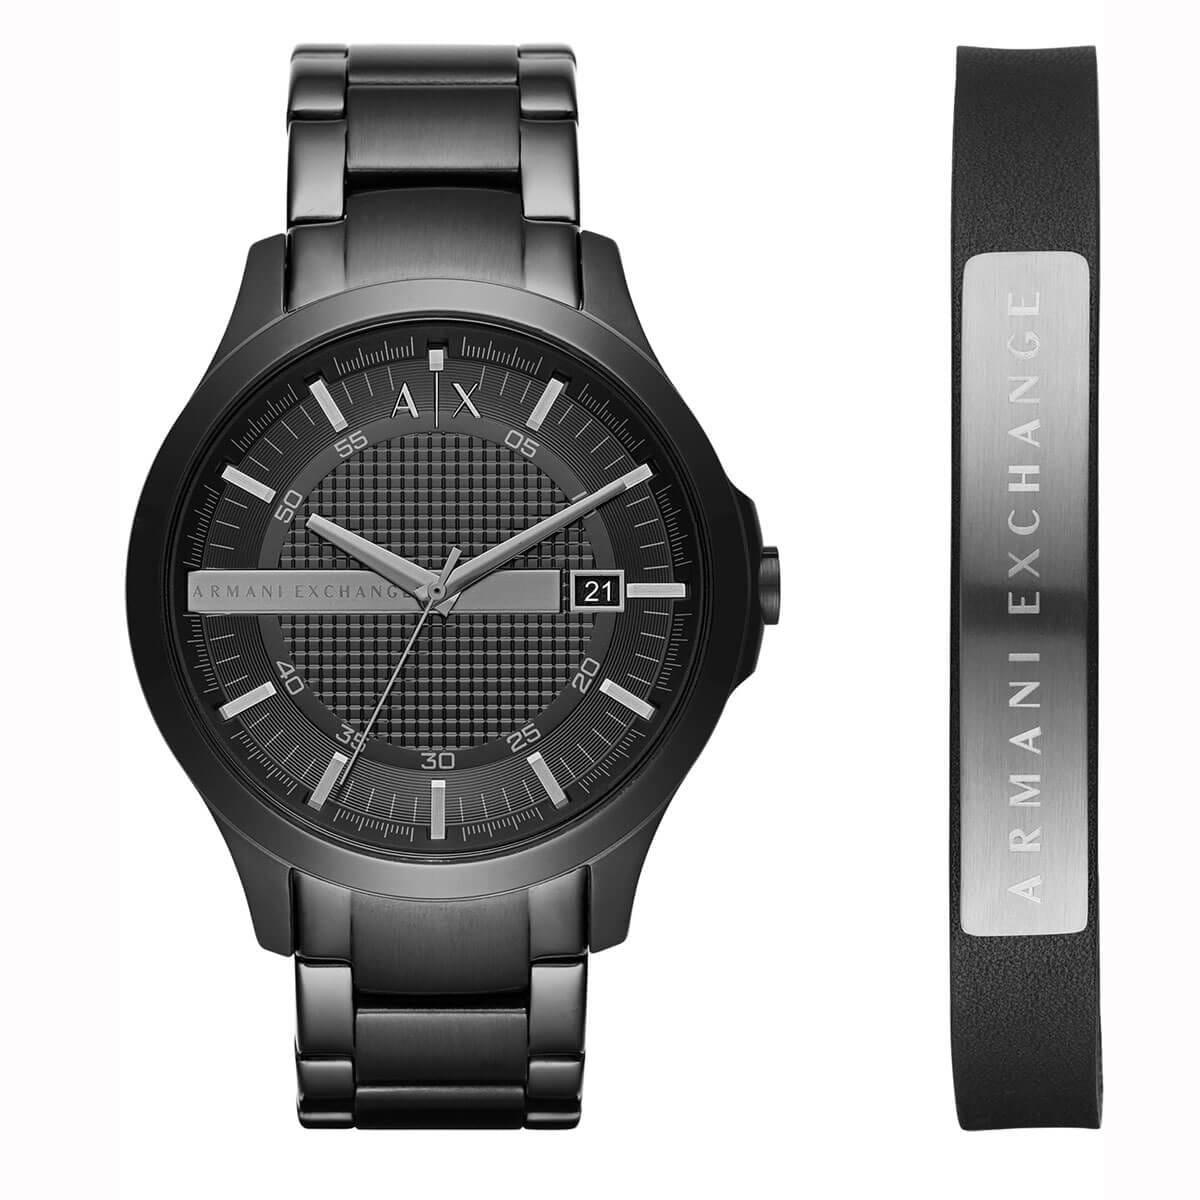 6257f929689c Reloj caballero armani exchange ax7101